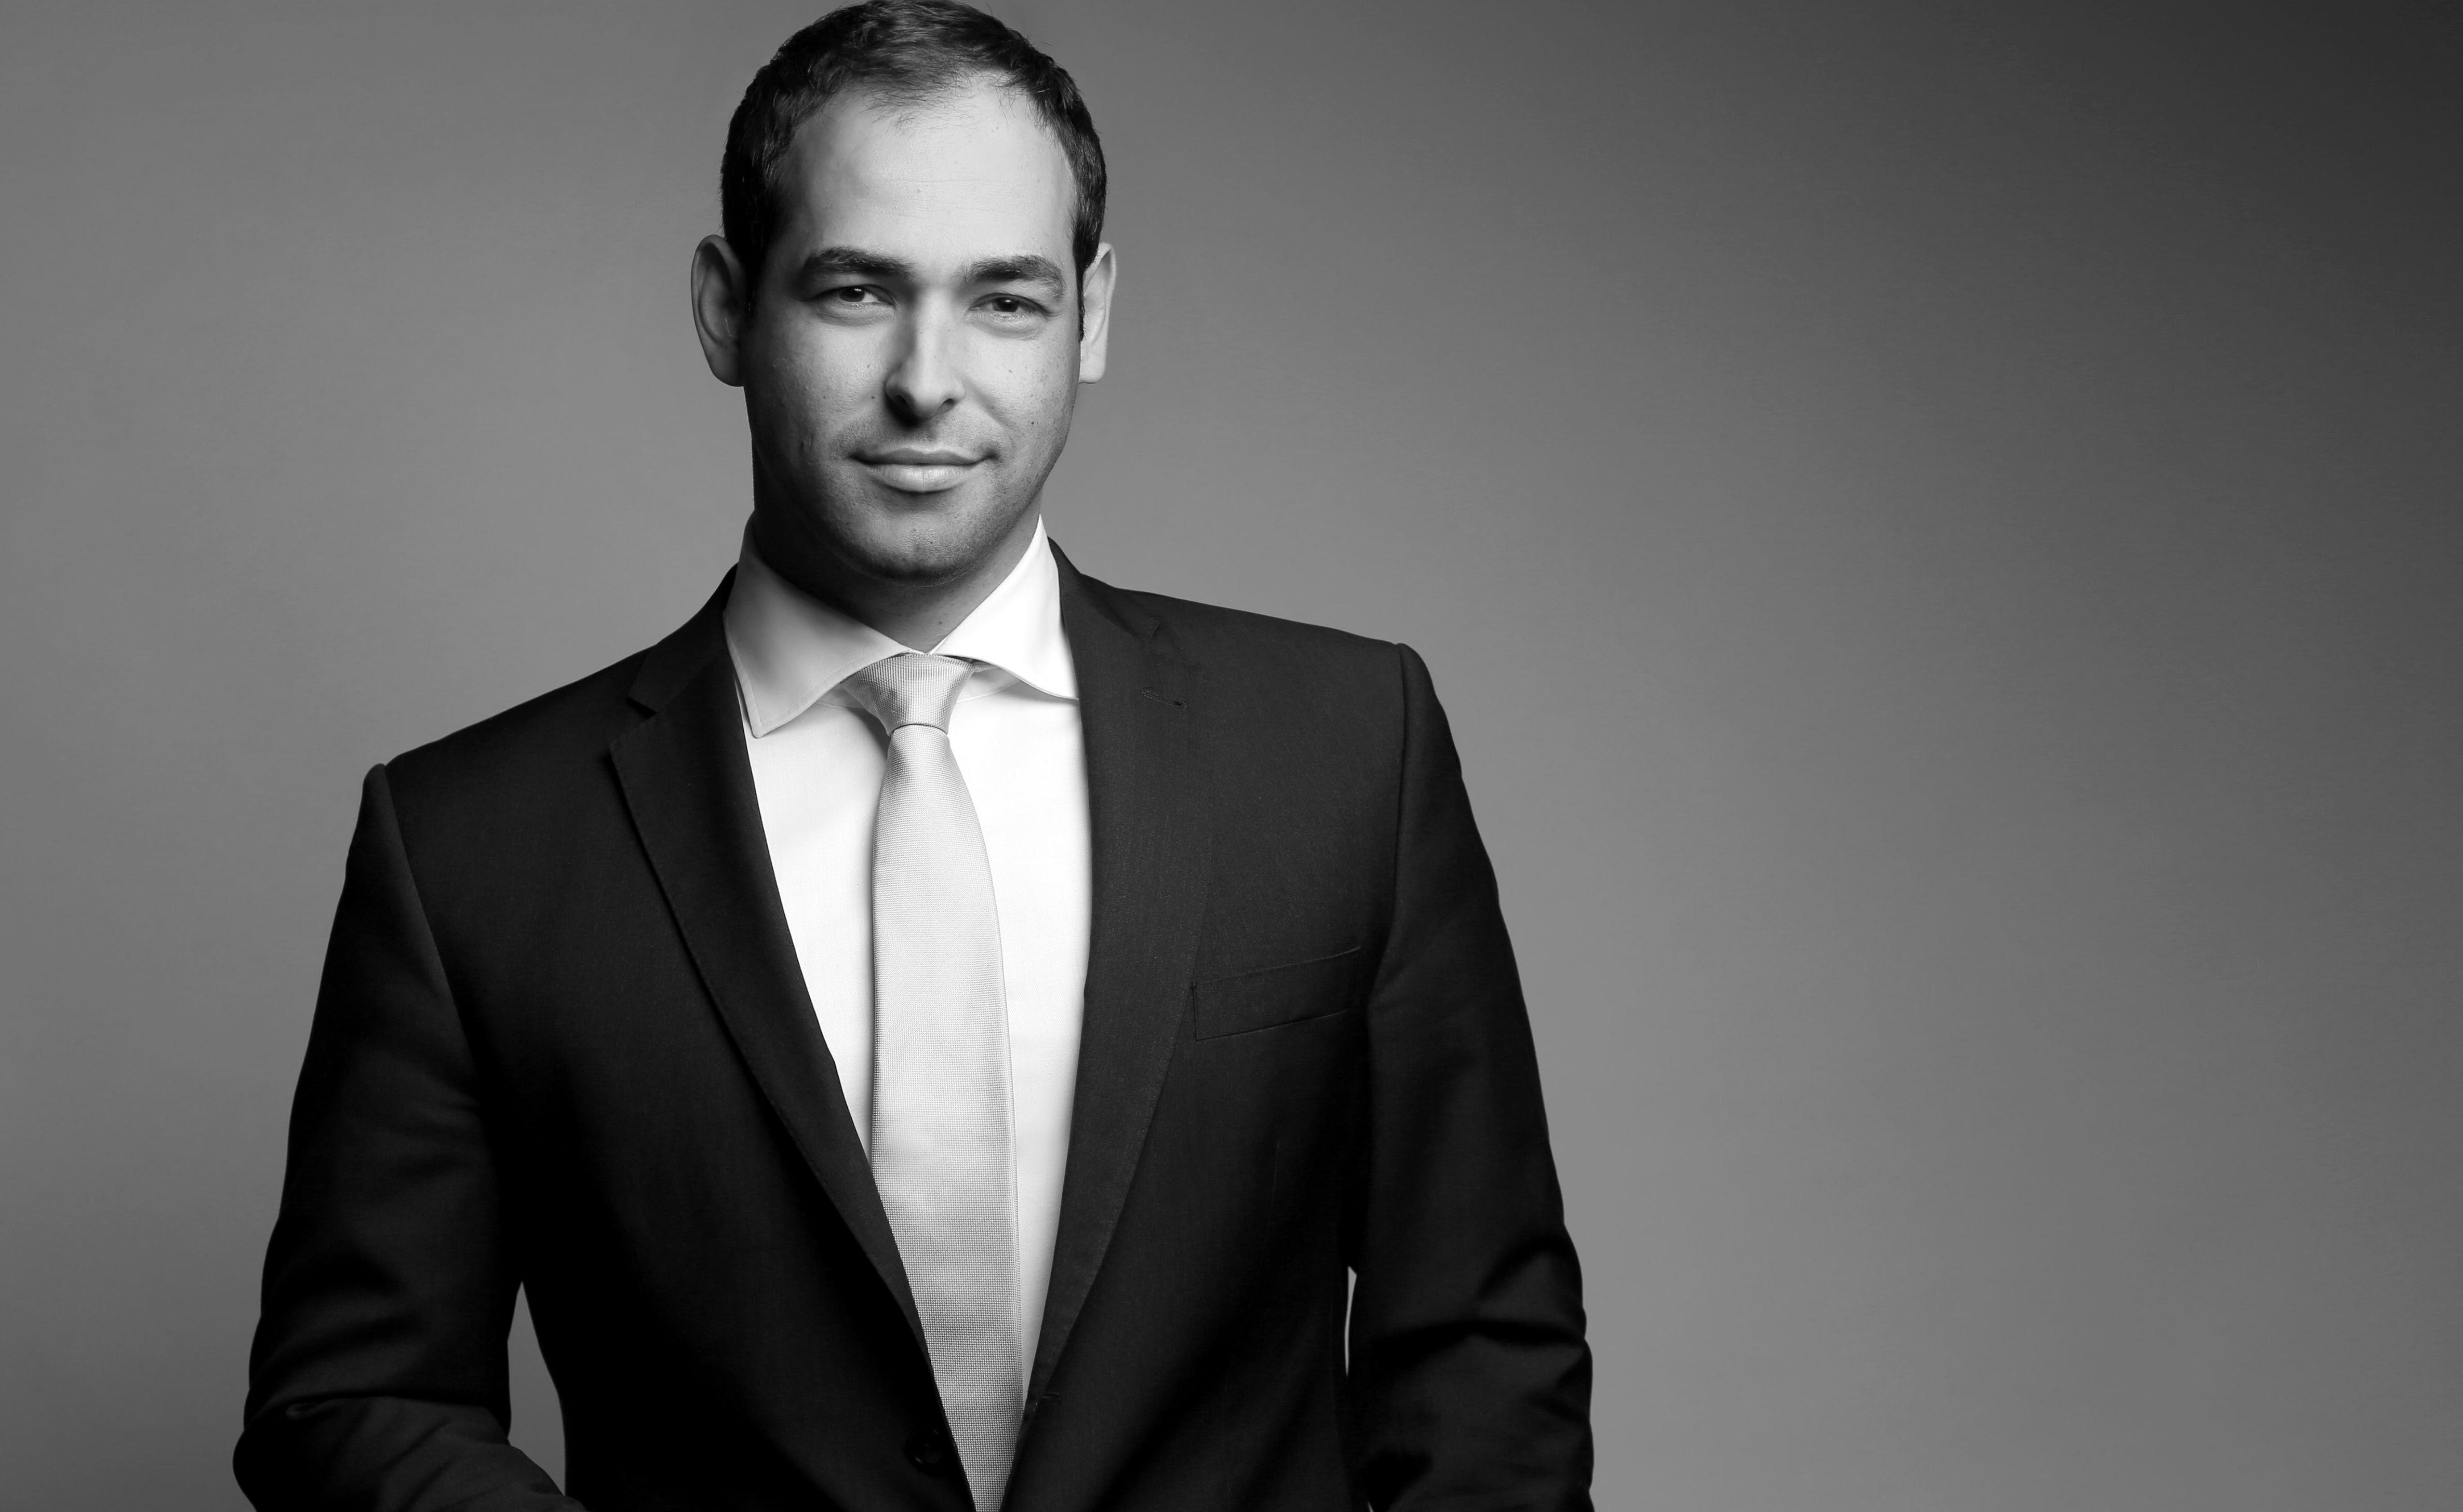 Rechtsanwalt Suad Omanovic